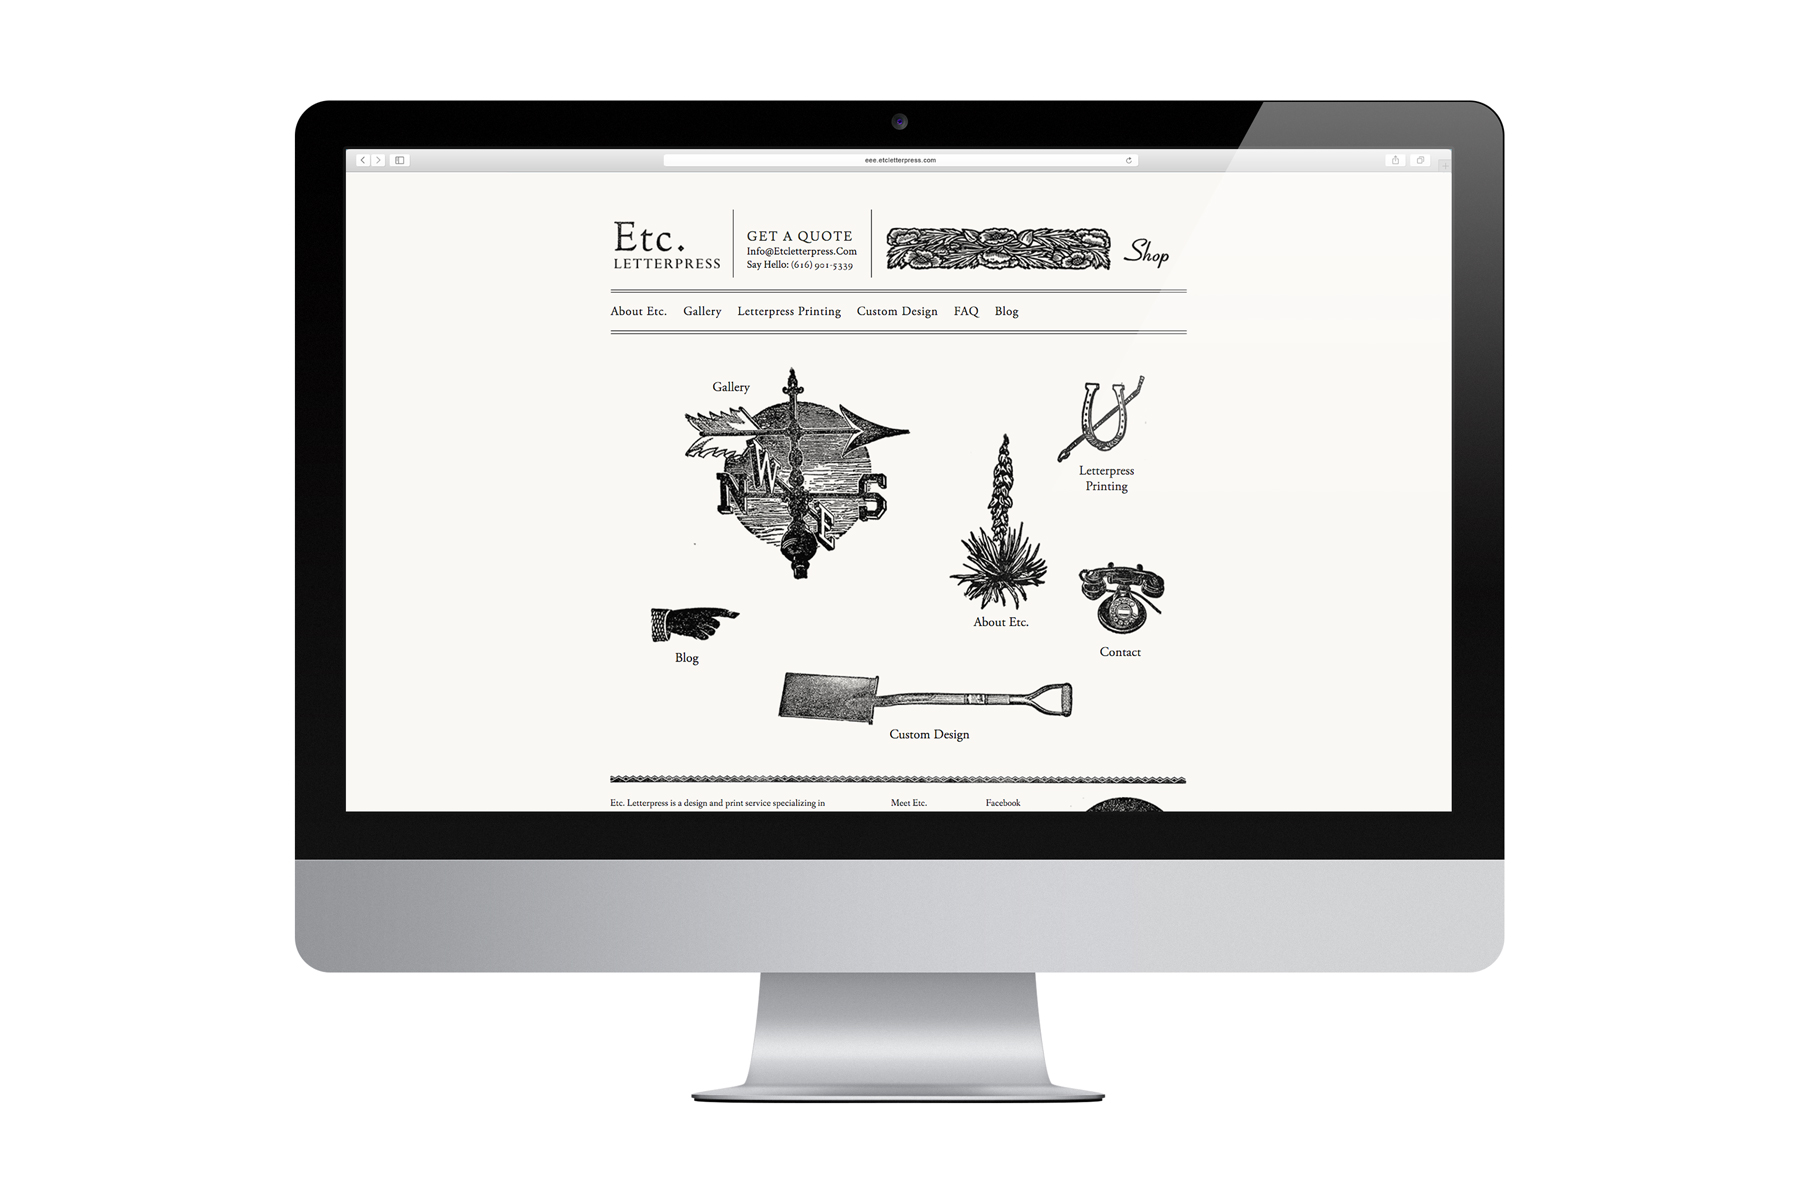 ETC-Letterpress_Website-Design_Rachelle-Sartini-Garner_03.jpg